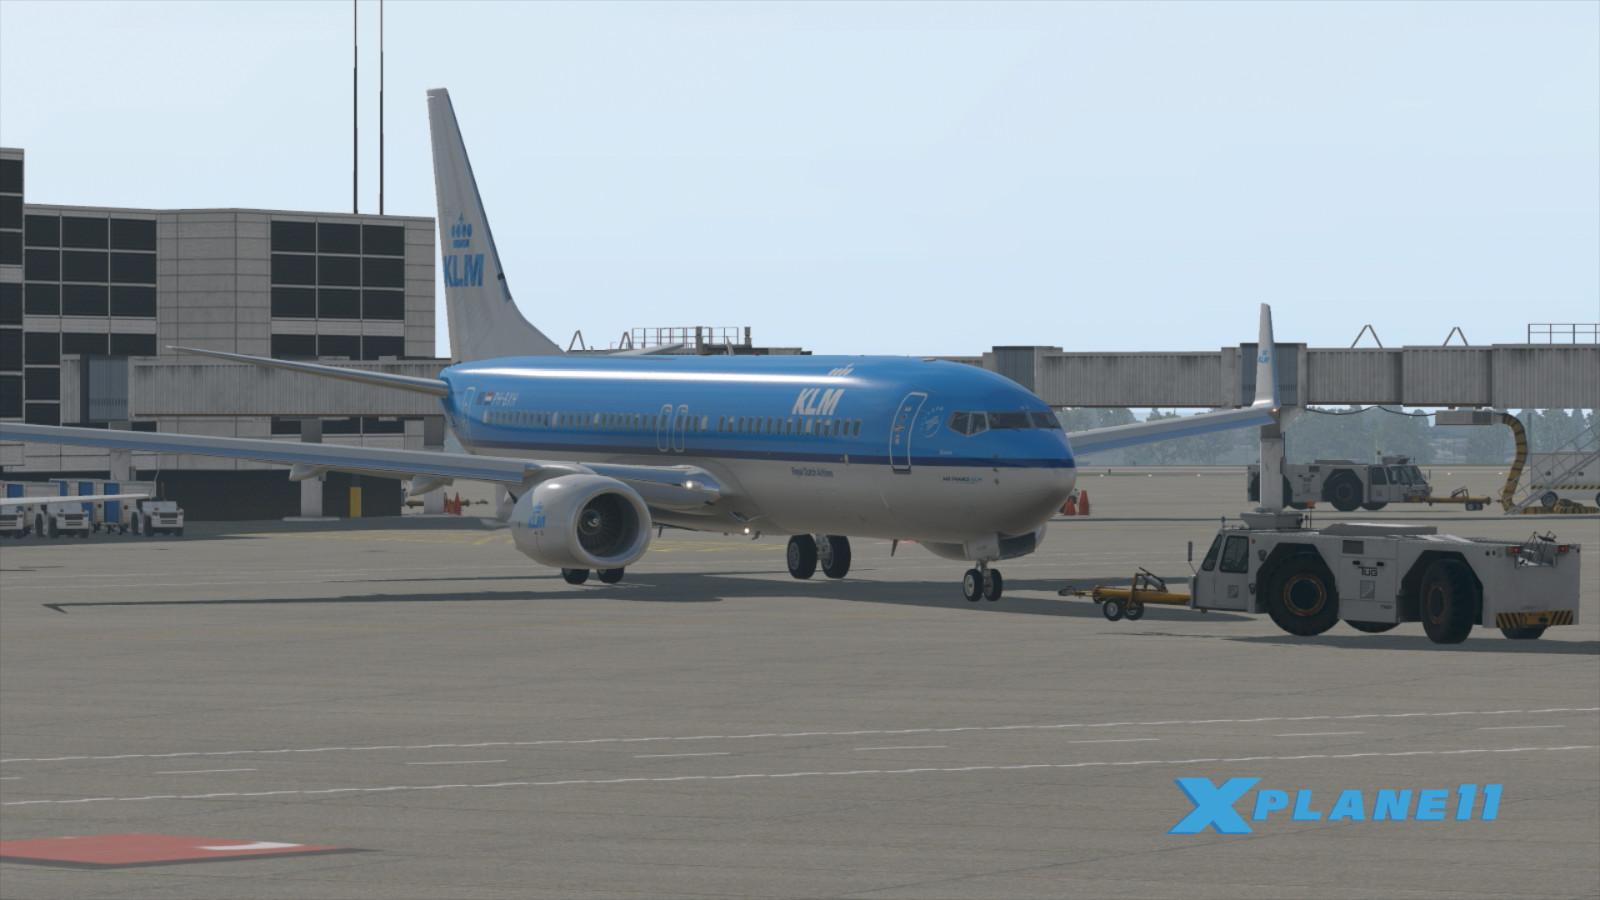 X-Plane 11 ESPAÑOL PC Full + Global Scenery DLC (CODEX) + REPACK 13 DVD5 (JPW) 3